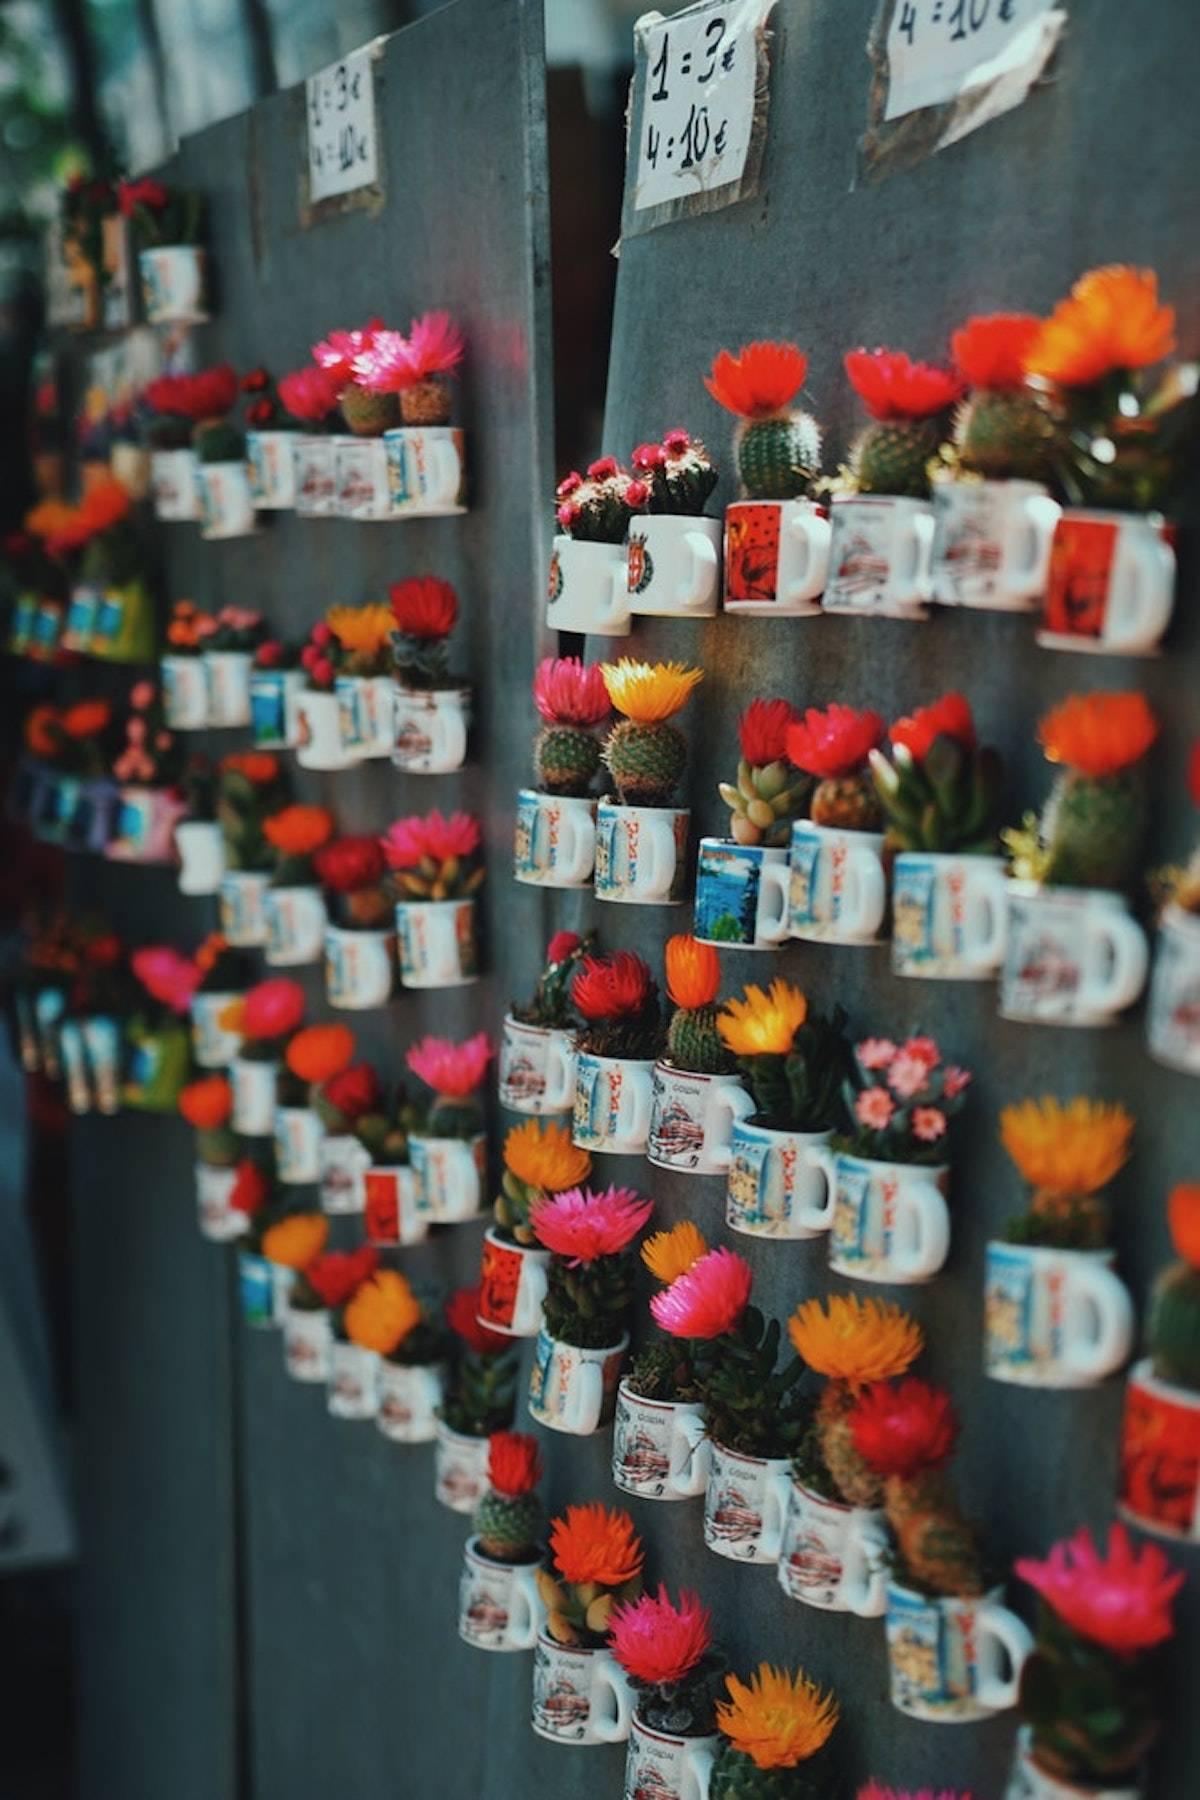 Imanes para decorar la nevera